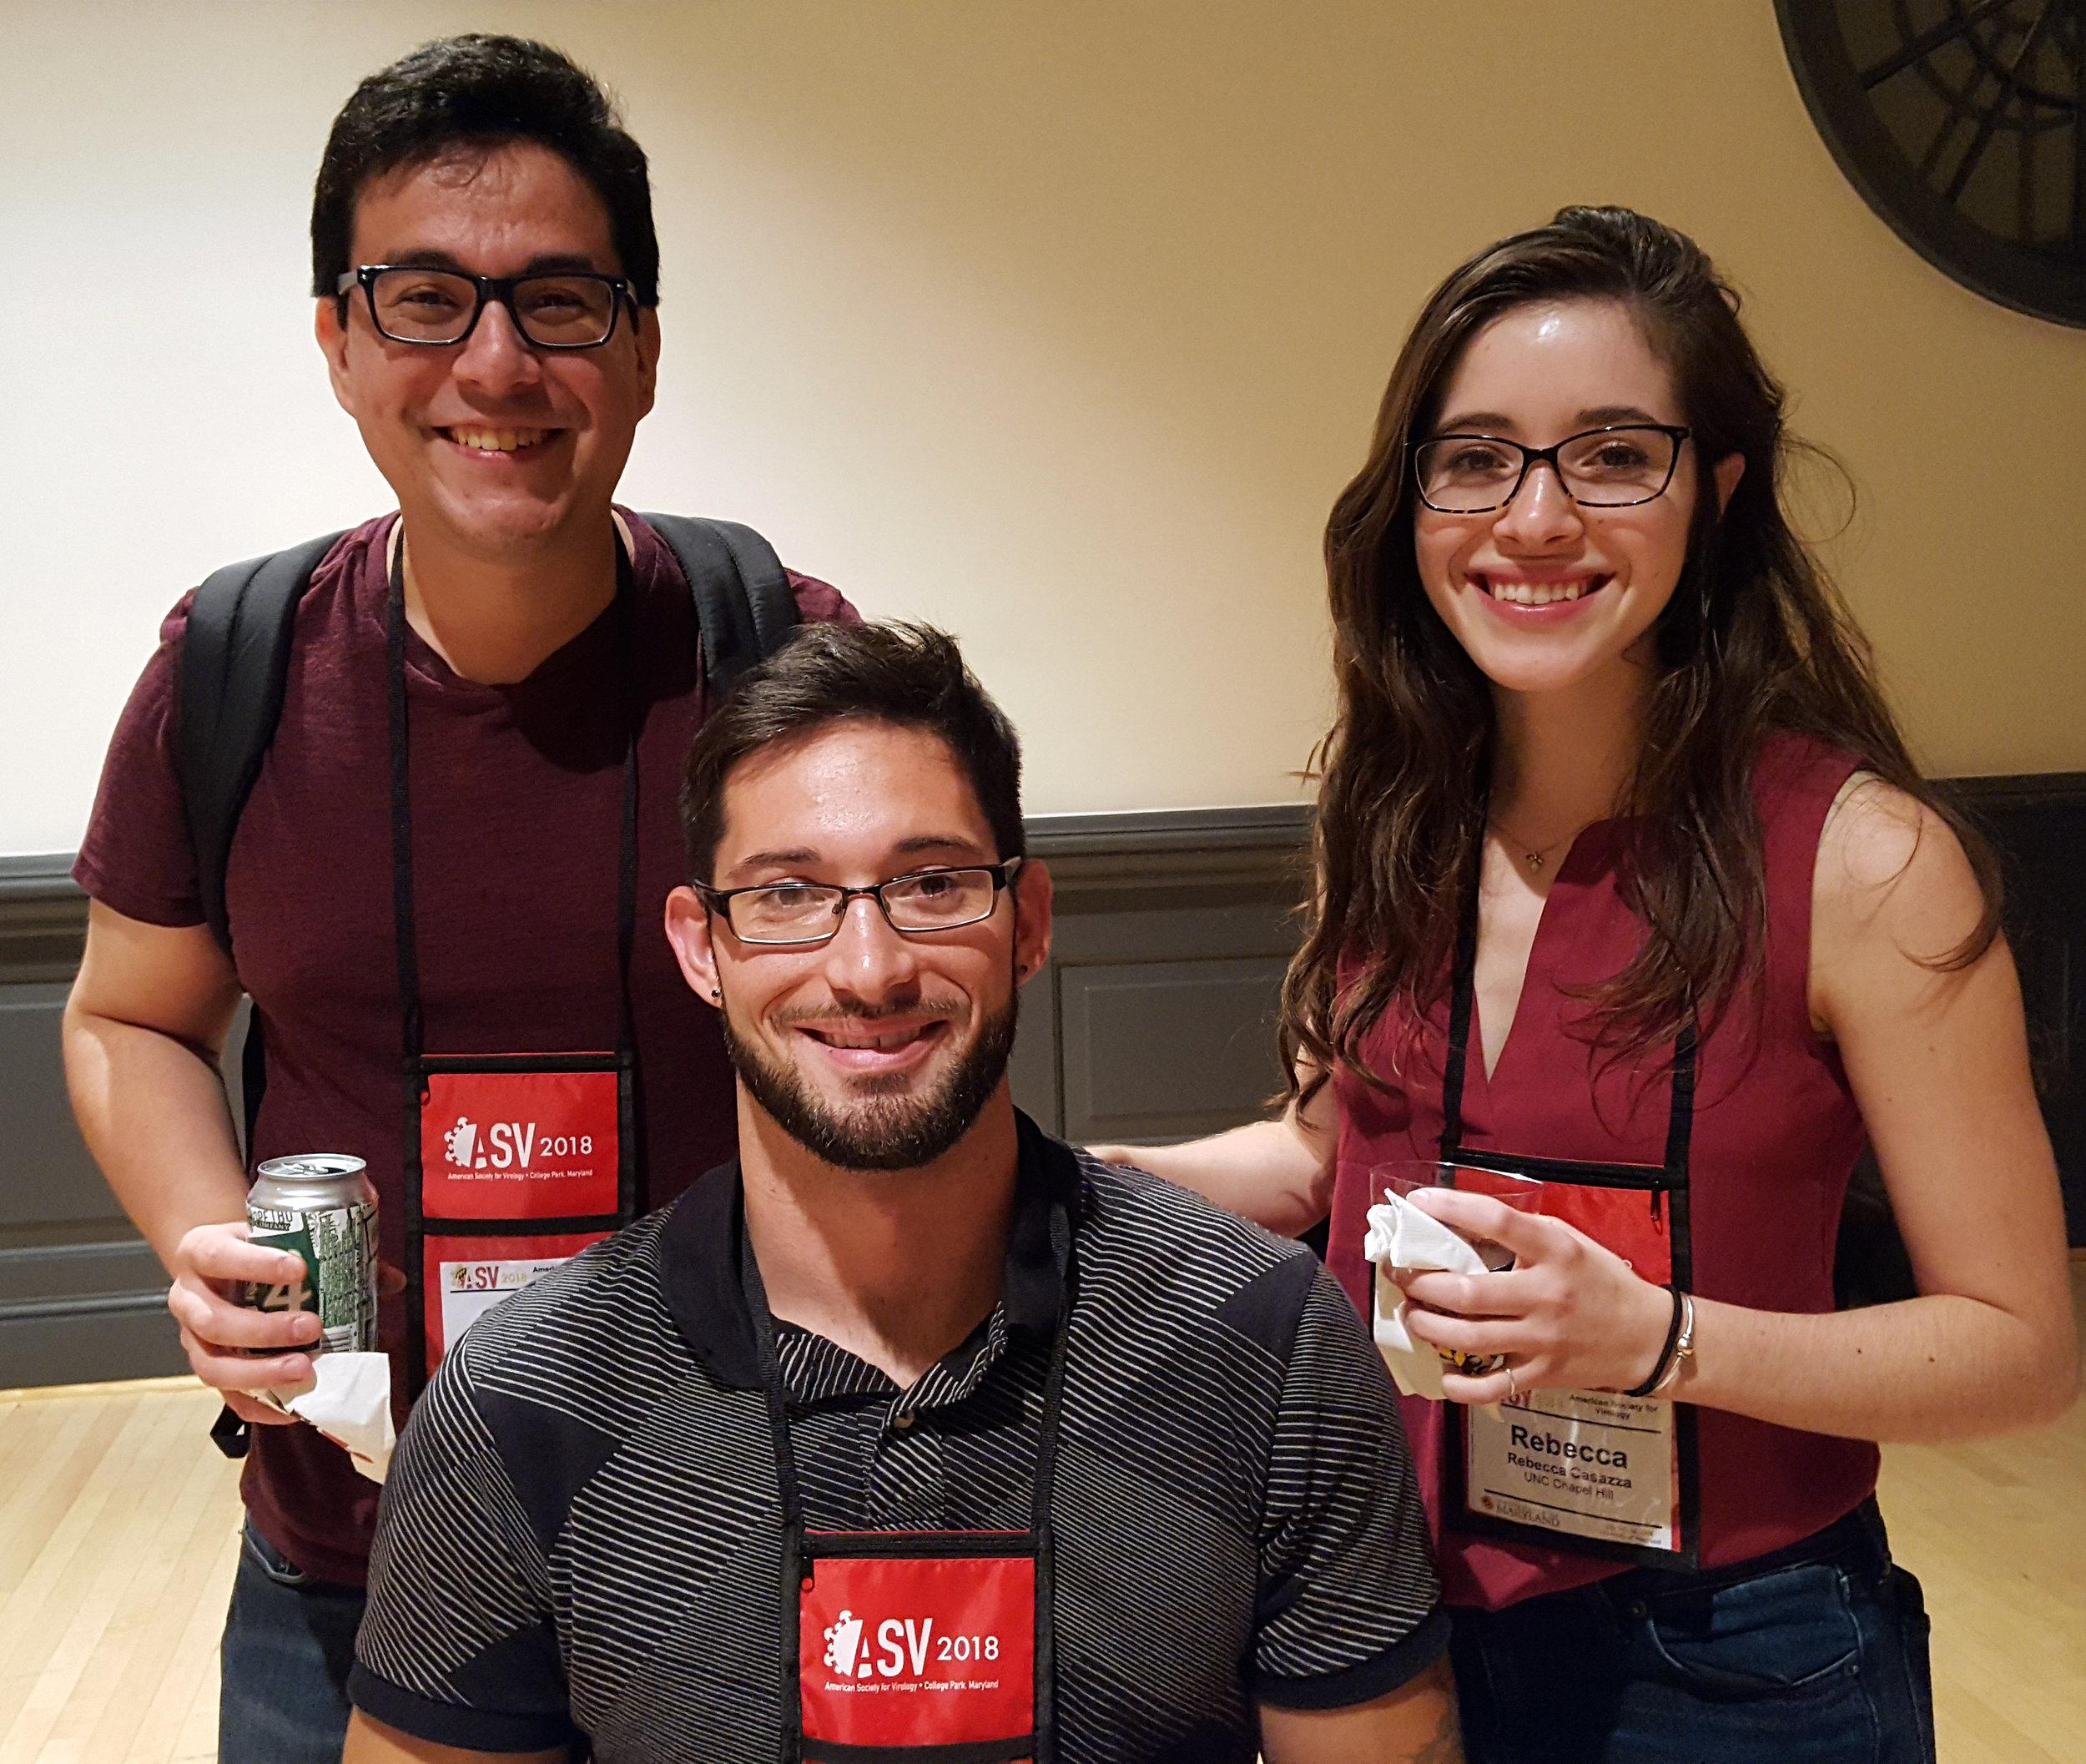 Cesar, derek, and becca - asv 2018